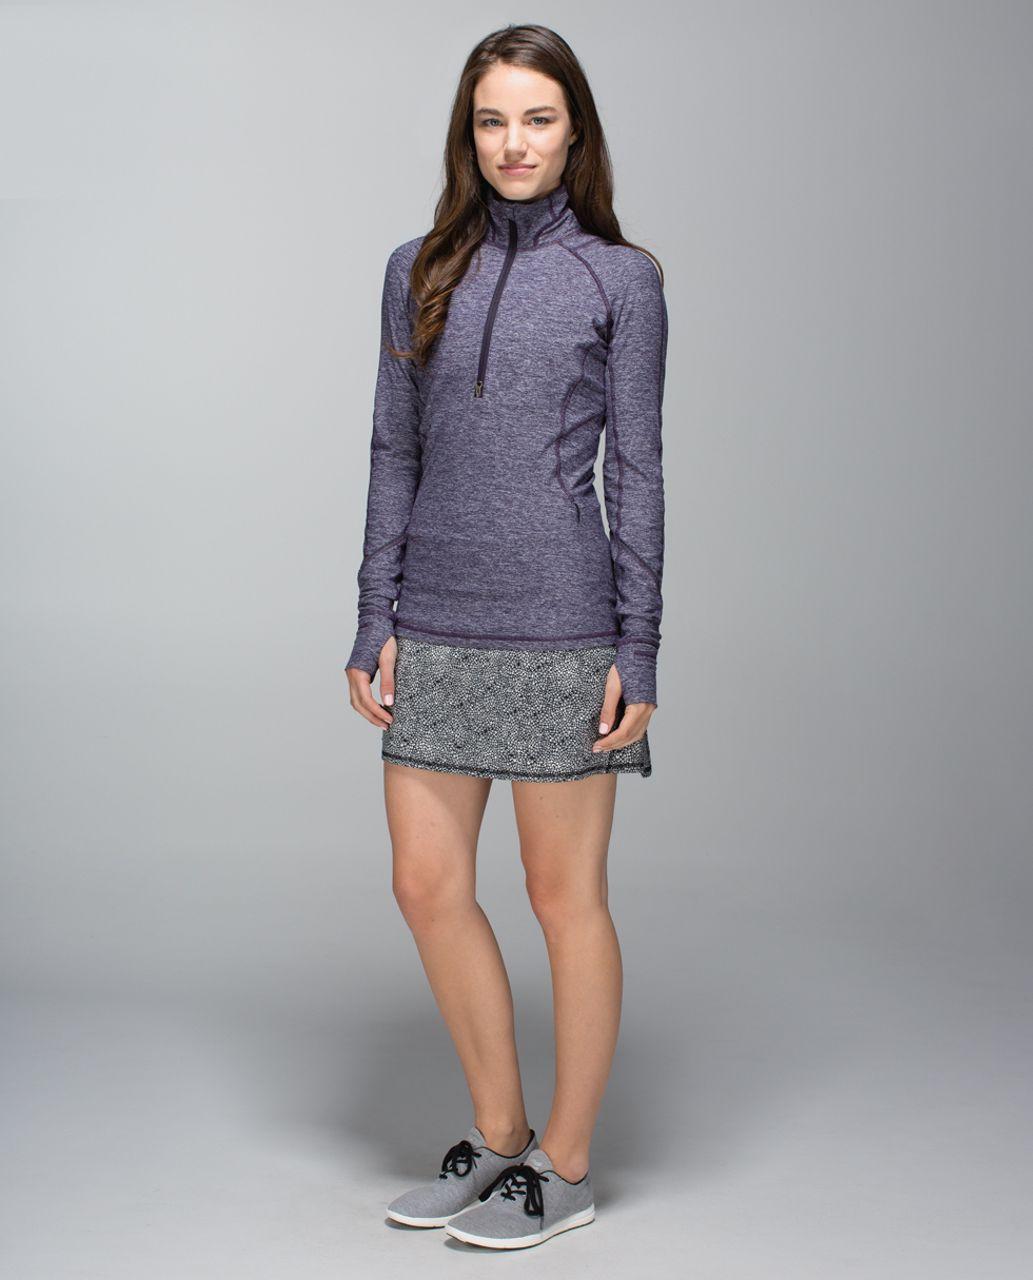 Lululemon Run:  Pace Setter Skirt *4-way Stretch (Tall) - Plush Petal Black Ghost / Black